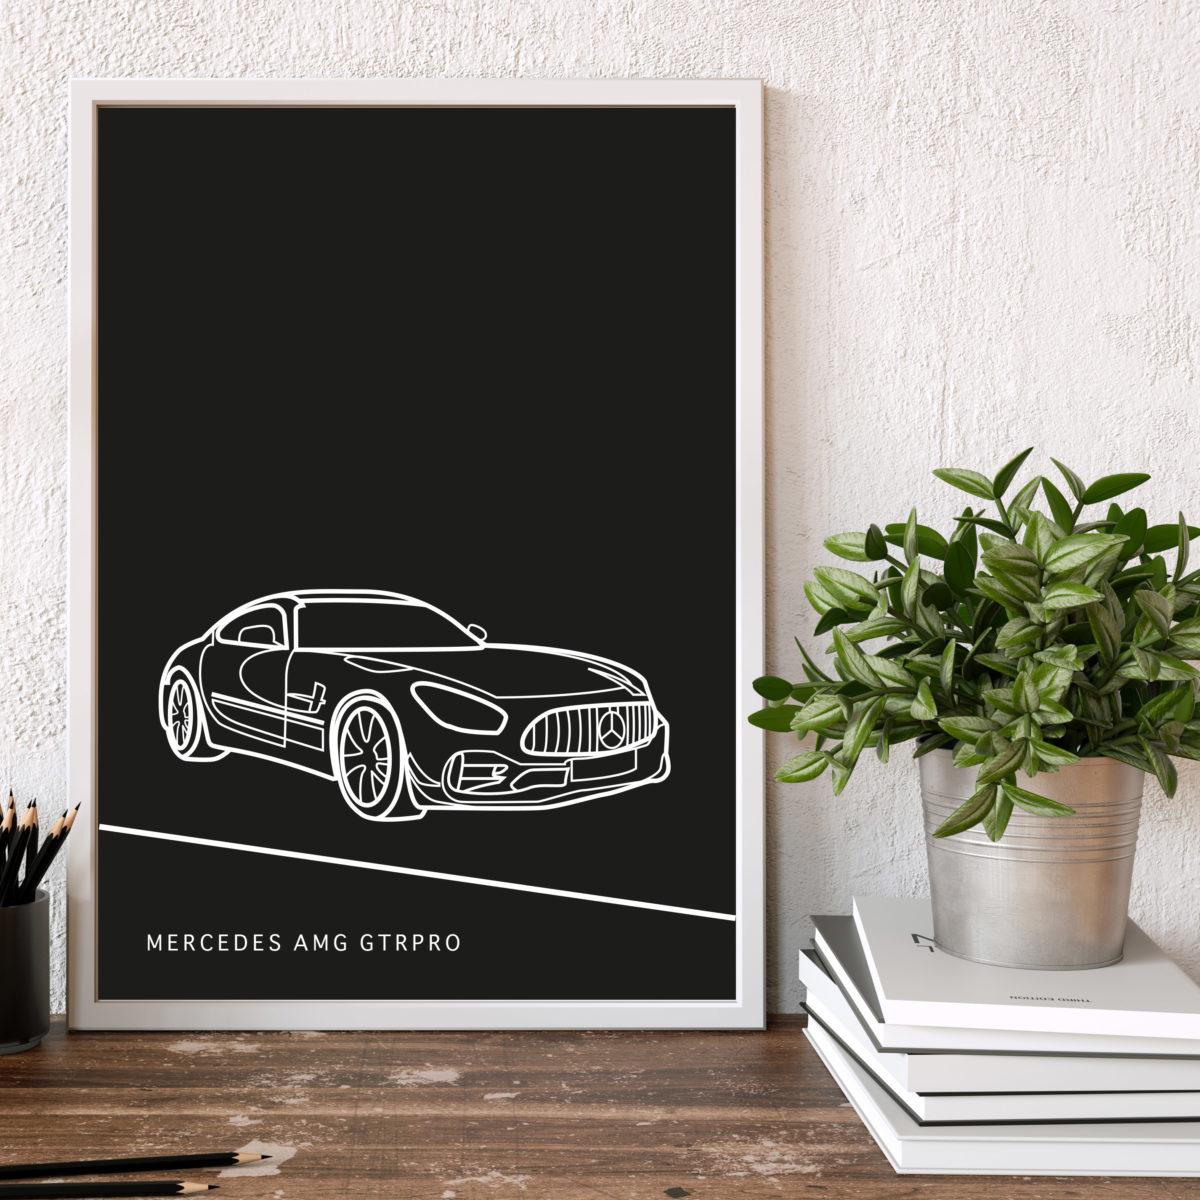 Mercedes AMG GTR Poster